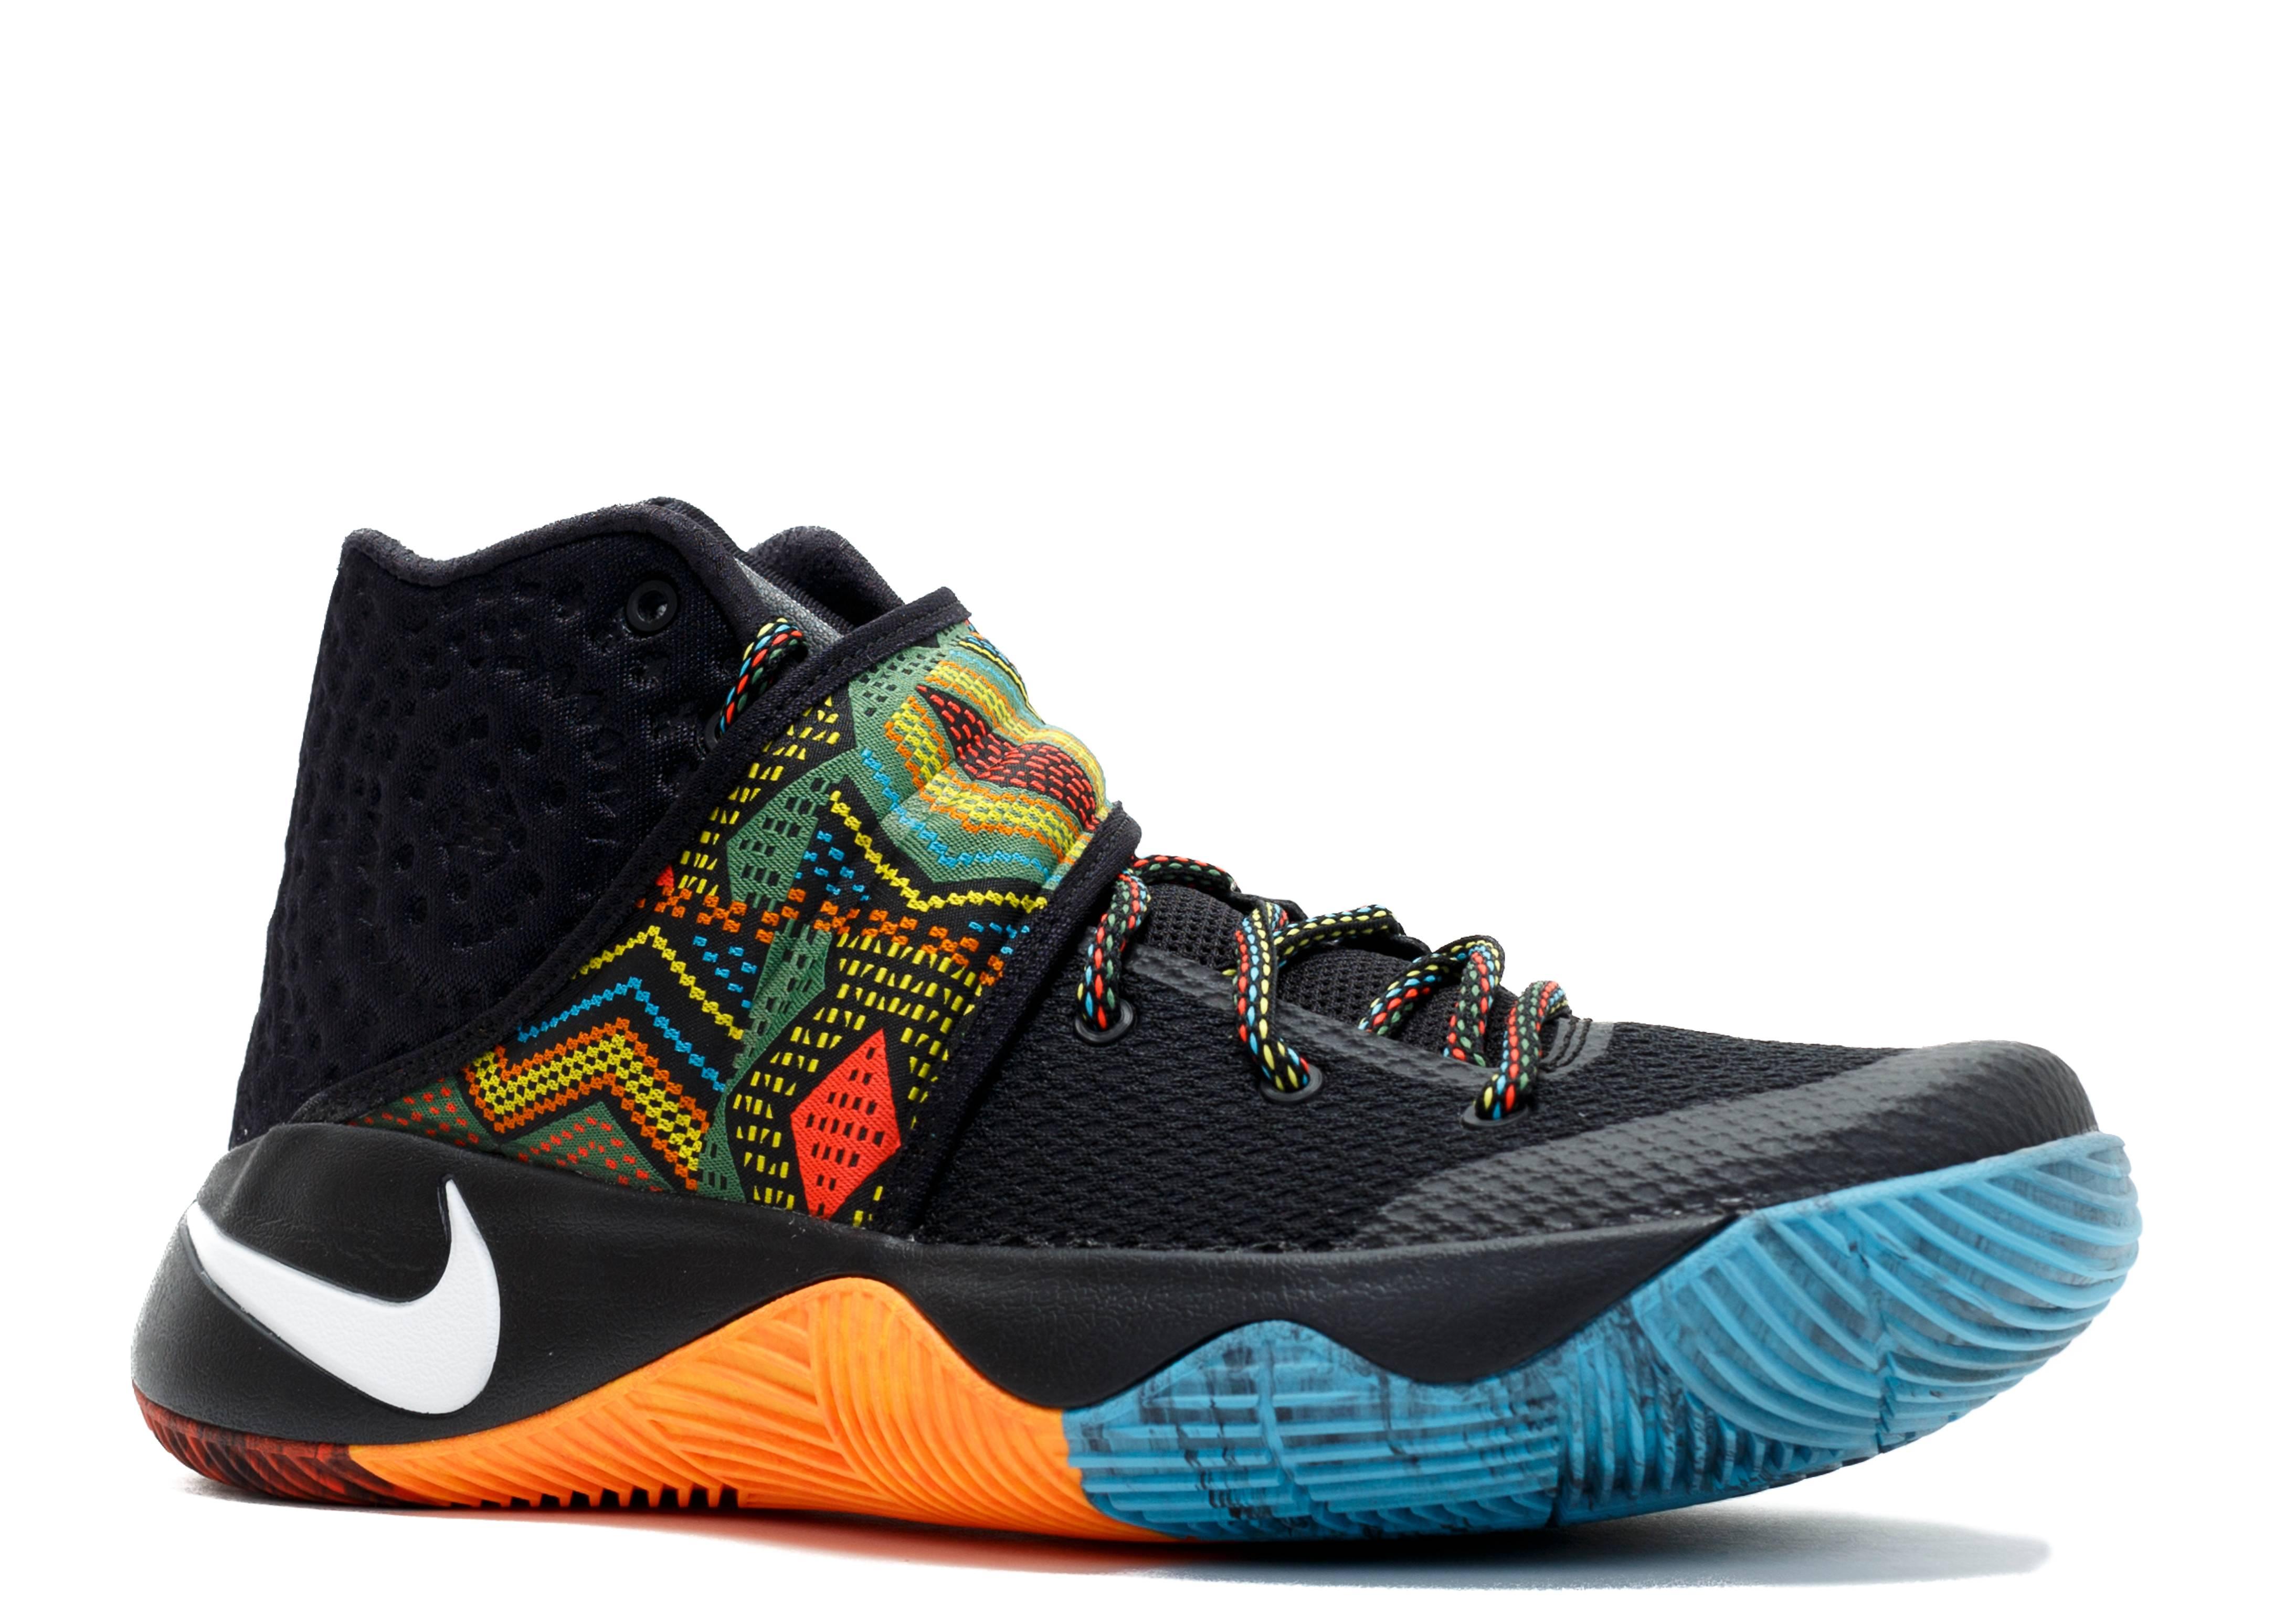 Nike Bhm Shoes